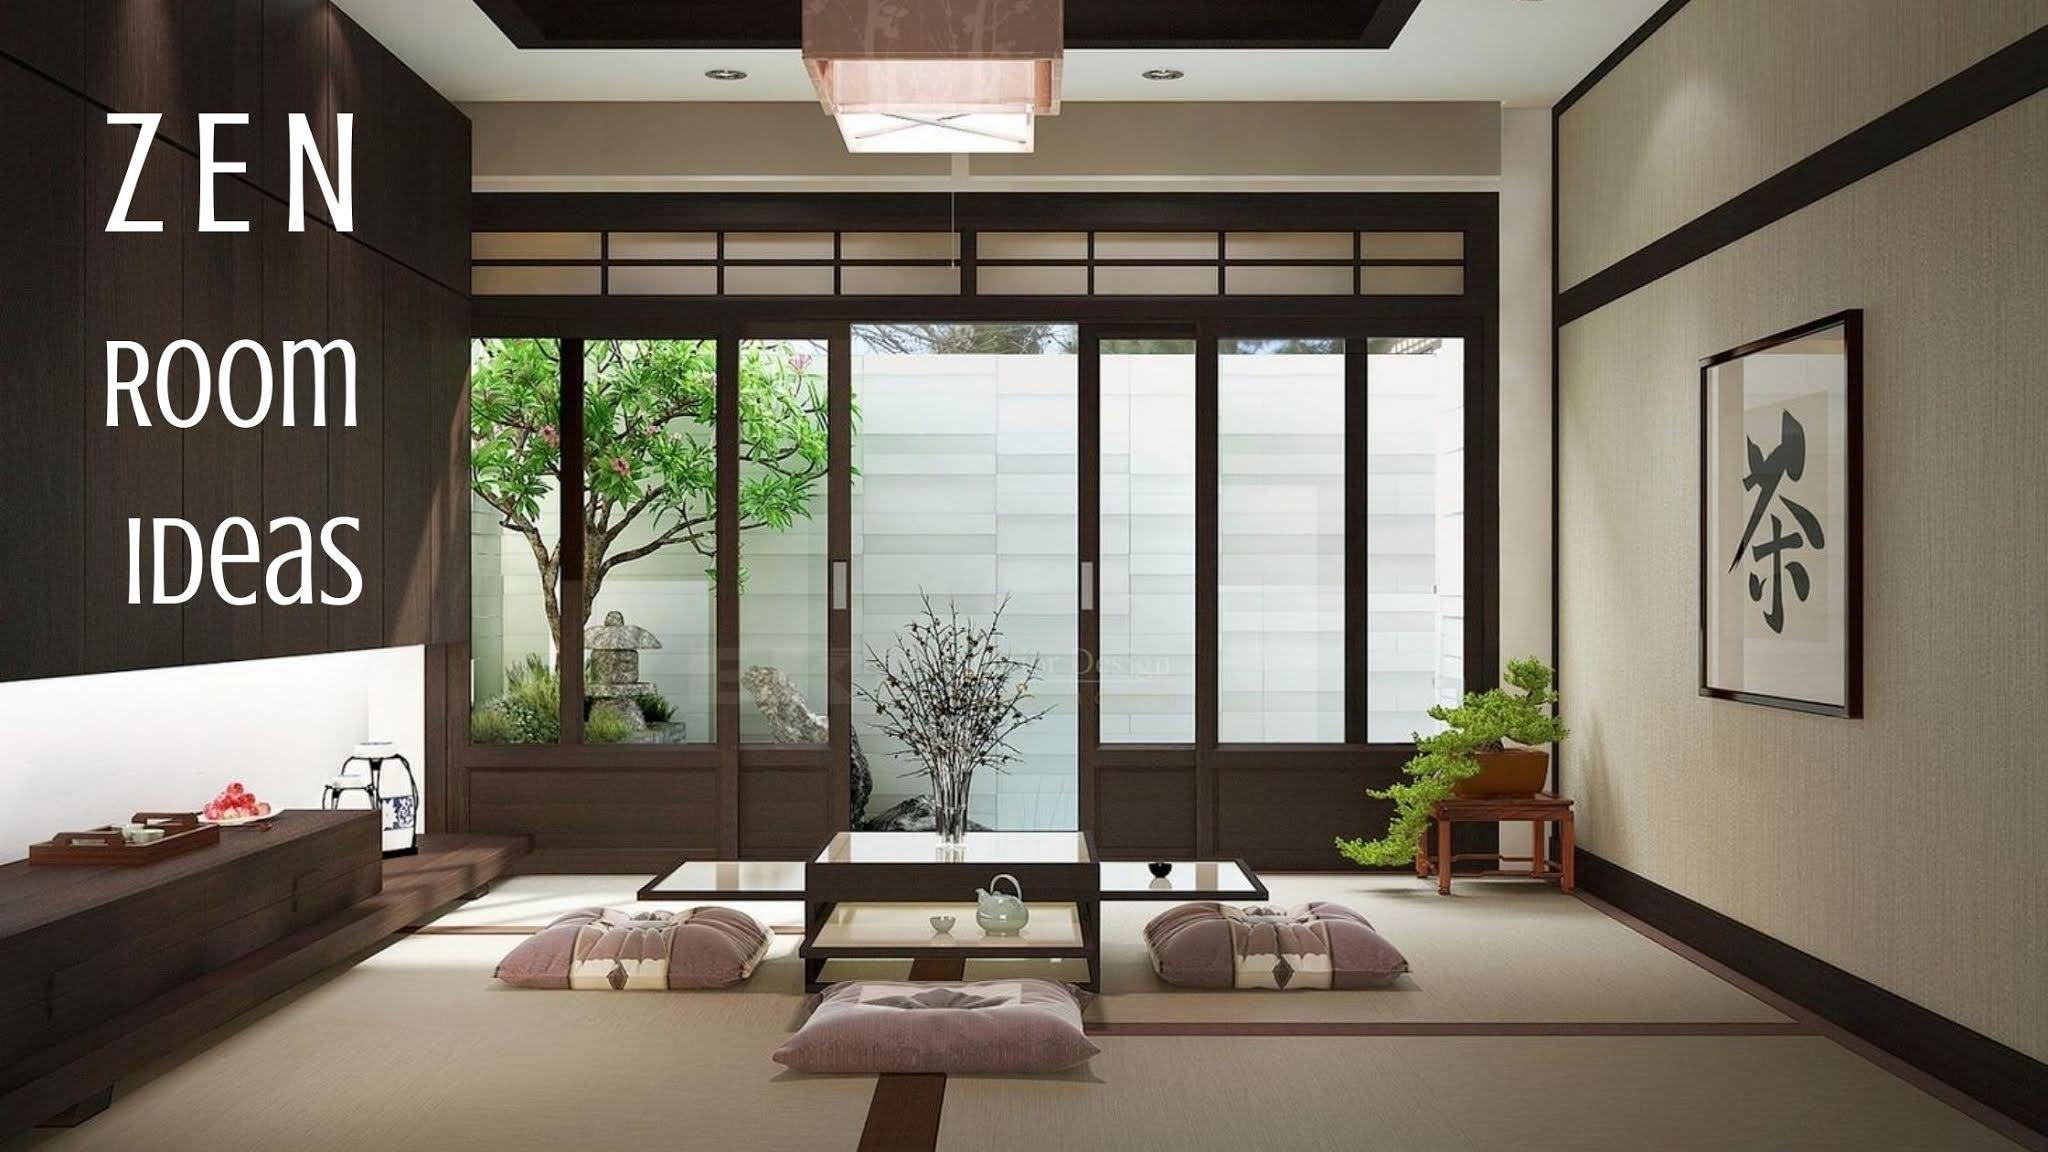 Zen Style Home Decoration Zen Room Ideas Home Design Ideas